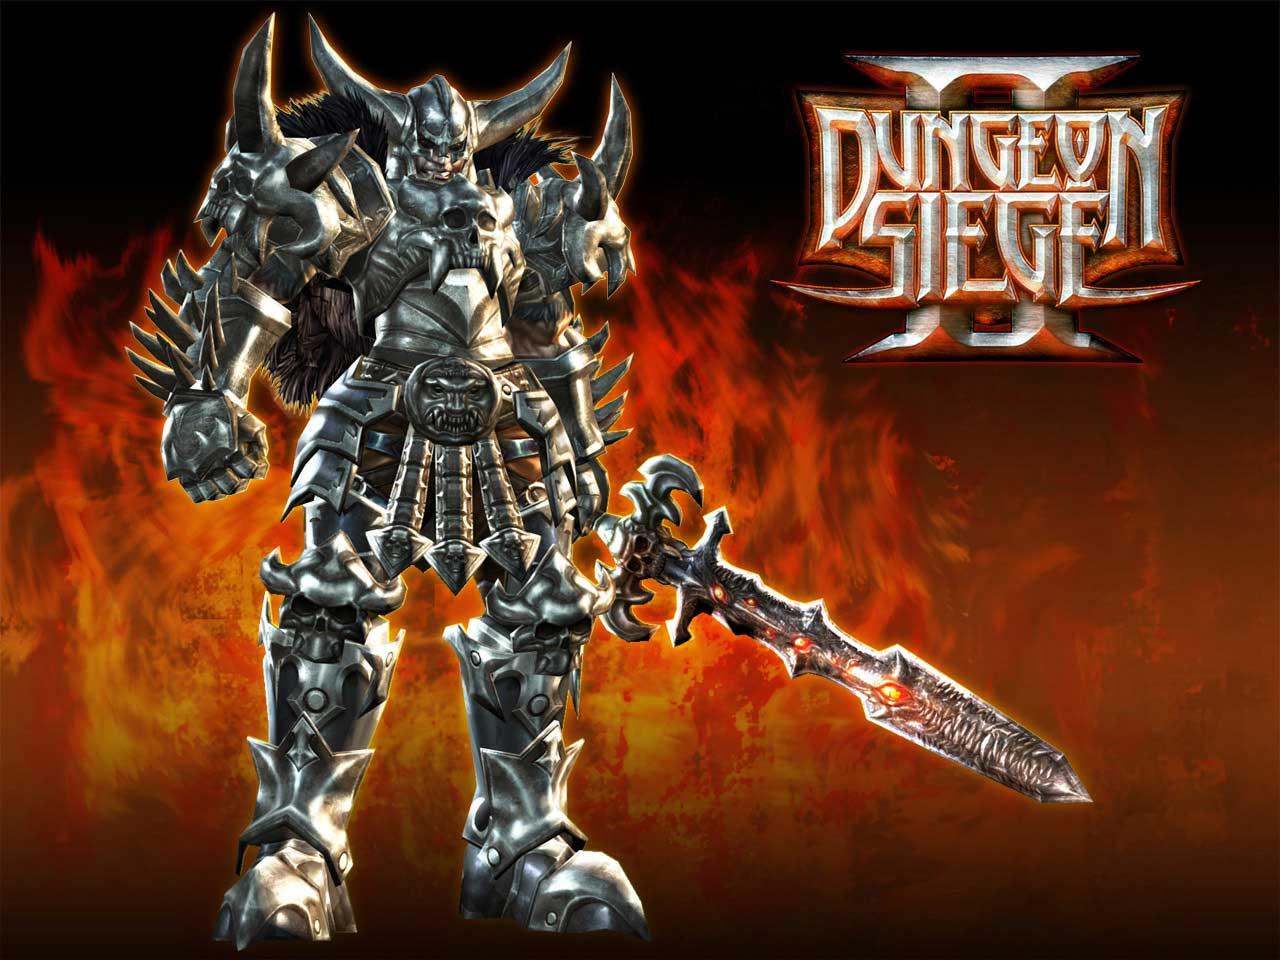 http://4.bp.blogspot.com/-2HmMGCbJbTg/TiKOzdM2niI/AAAAAAAABns/HlzovlEVkB8/s1600/Dungeon+Siege+2+%25284%2529.jpg